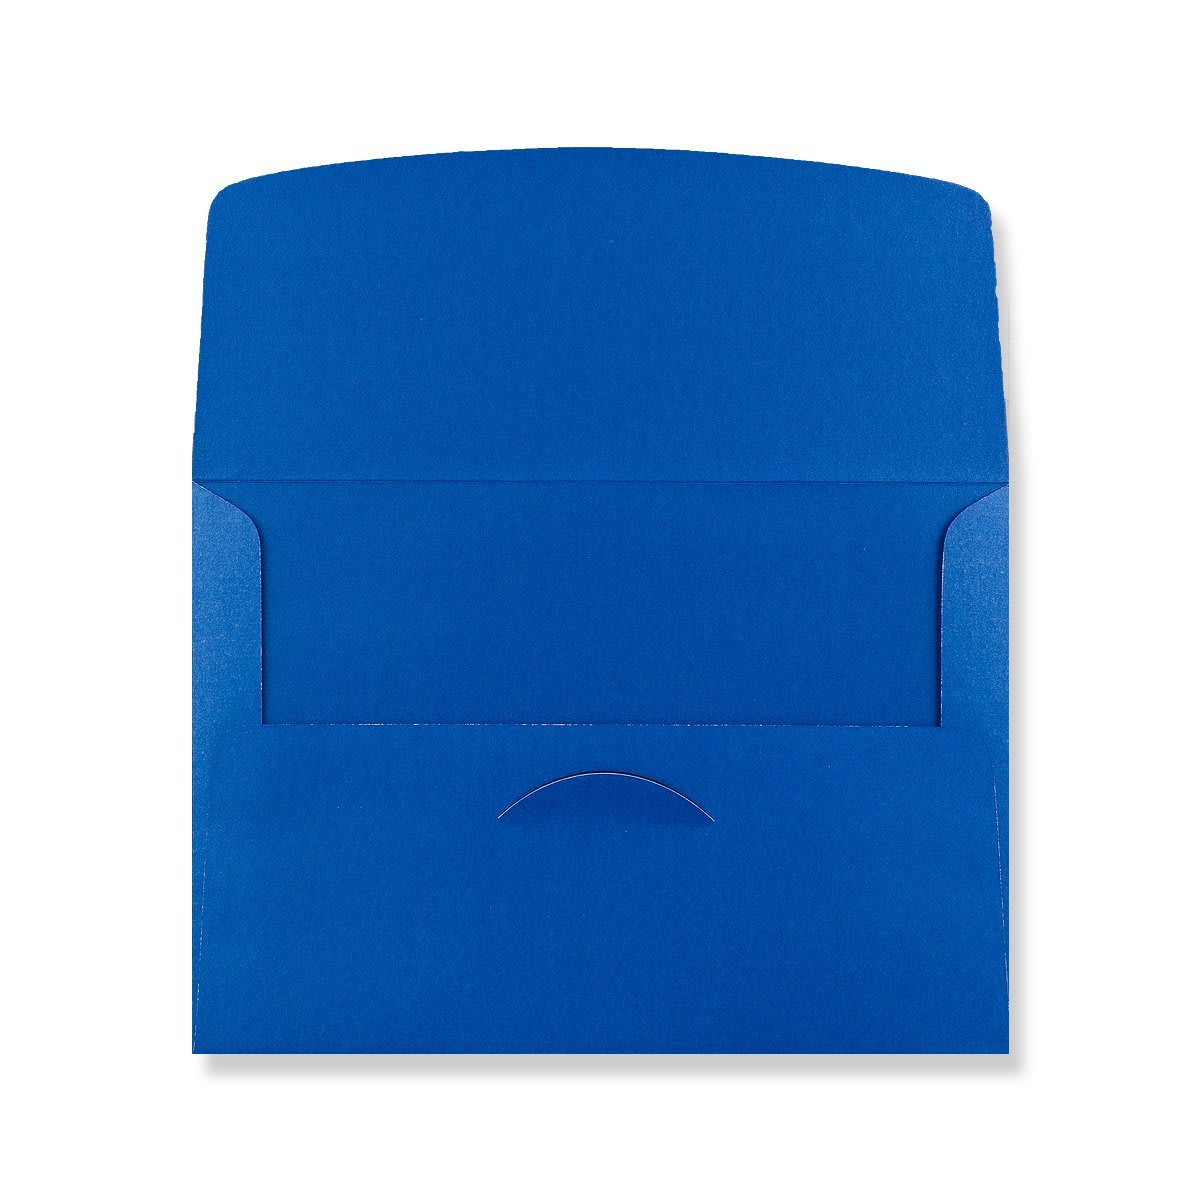 140 x 200mm DARK BLUE PEARLESCENT ANNOUNCEMENT ENVELOPES